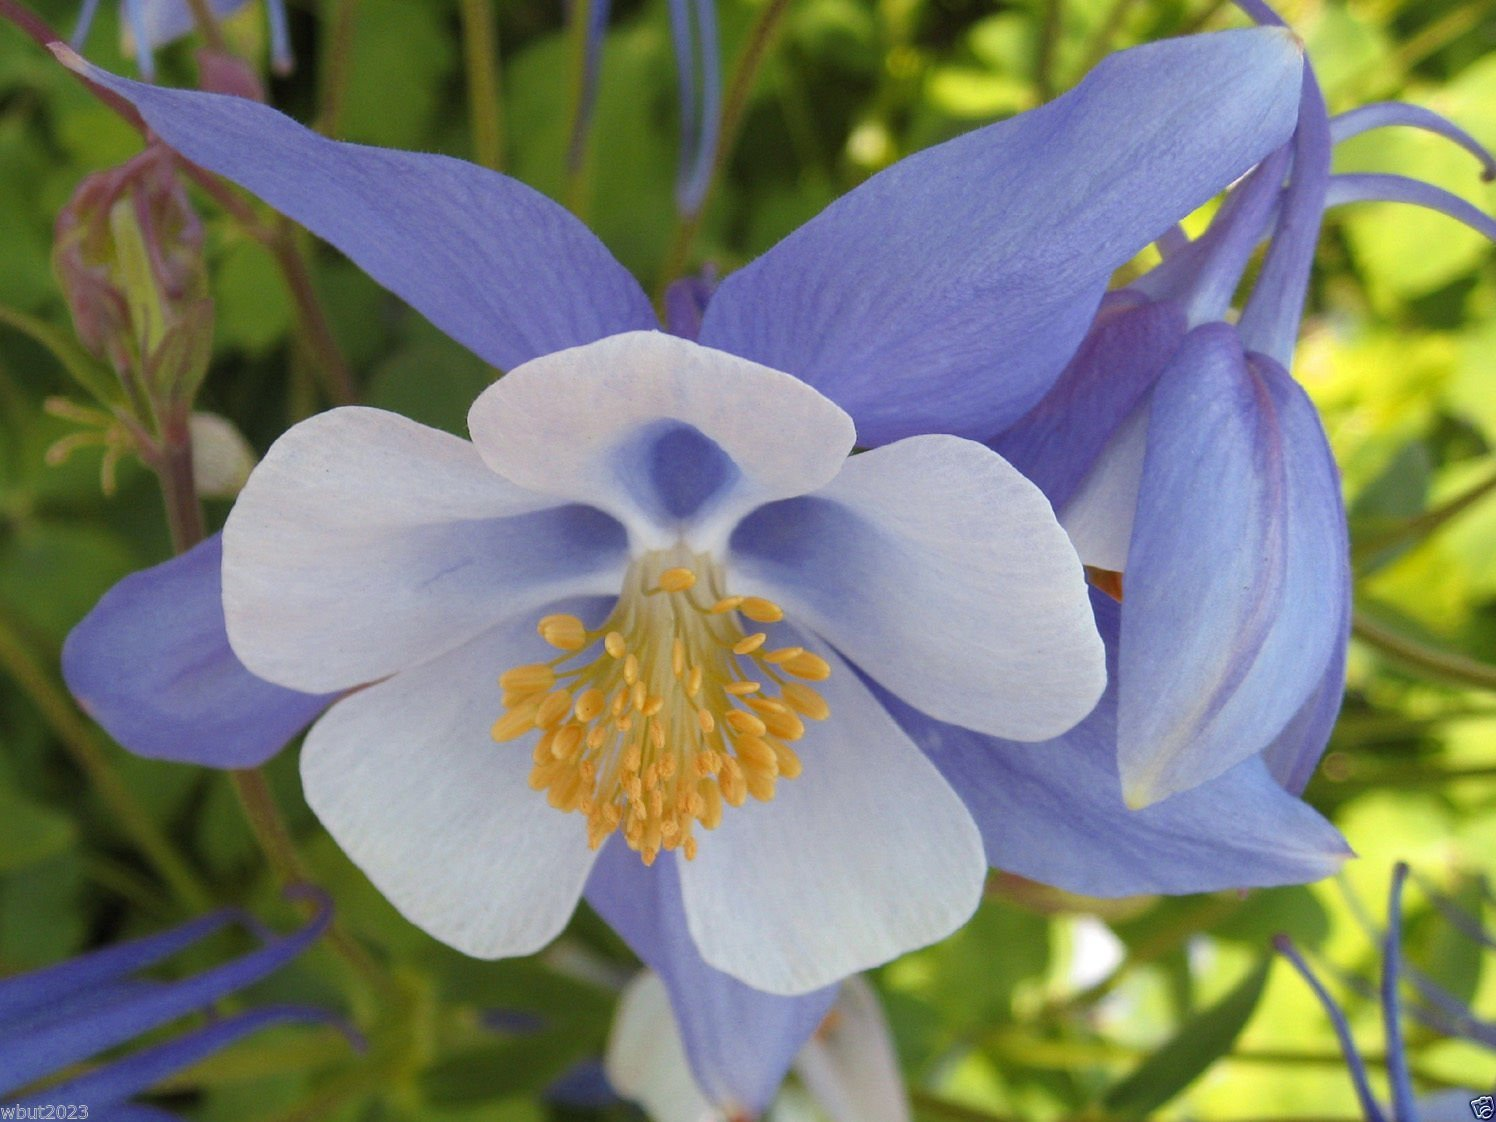 Amazon 100 Seeds Aquilegia Coerulea Colorado Blue Columbine